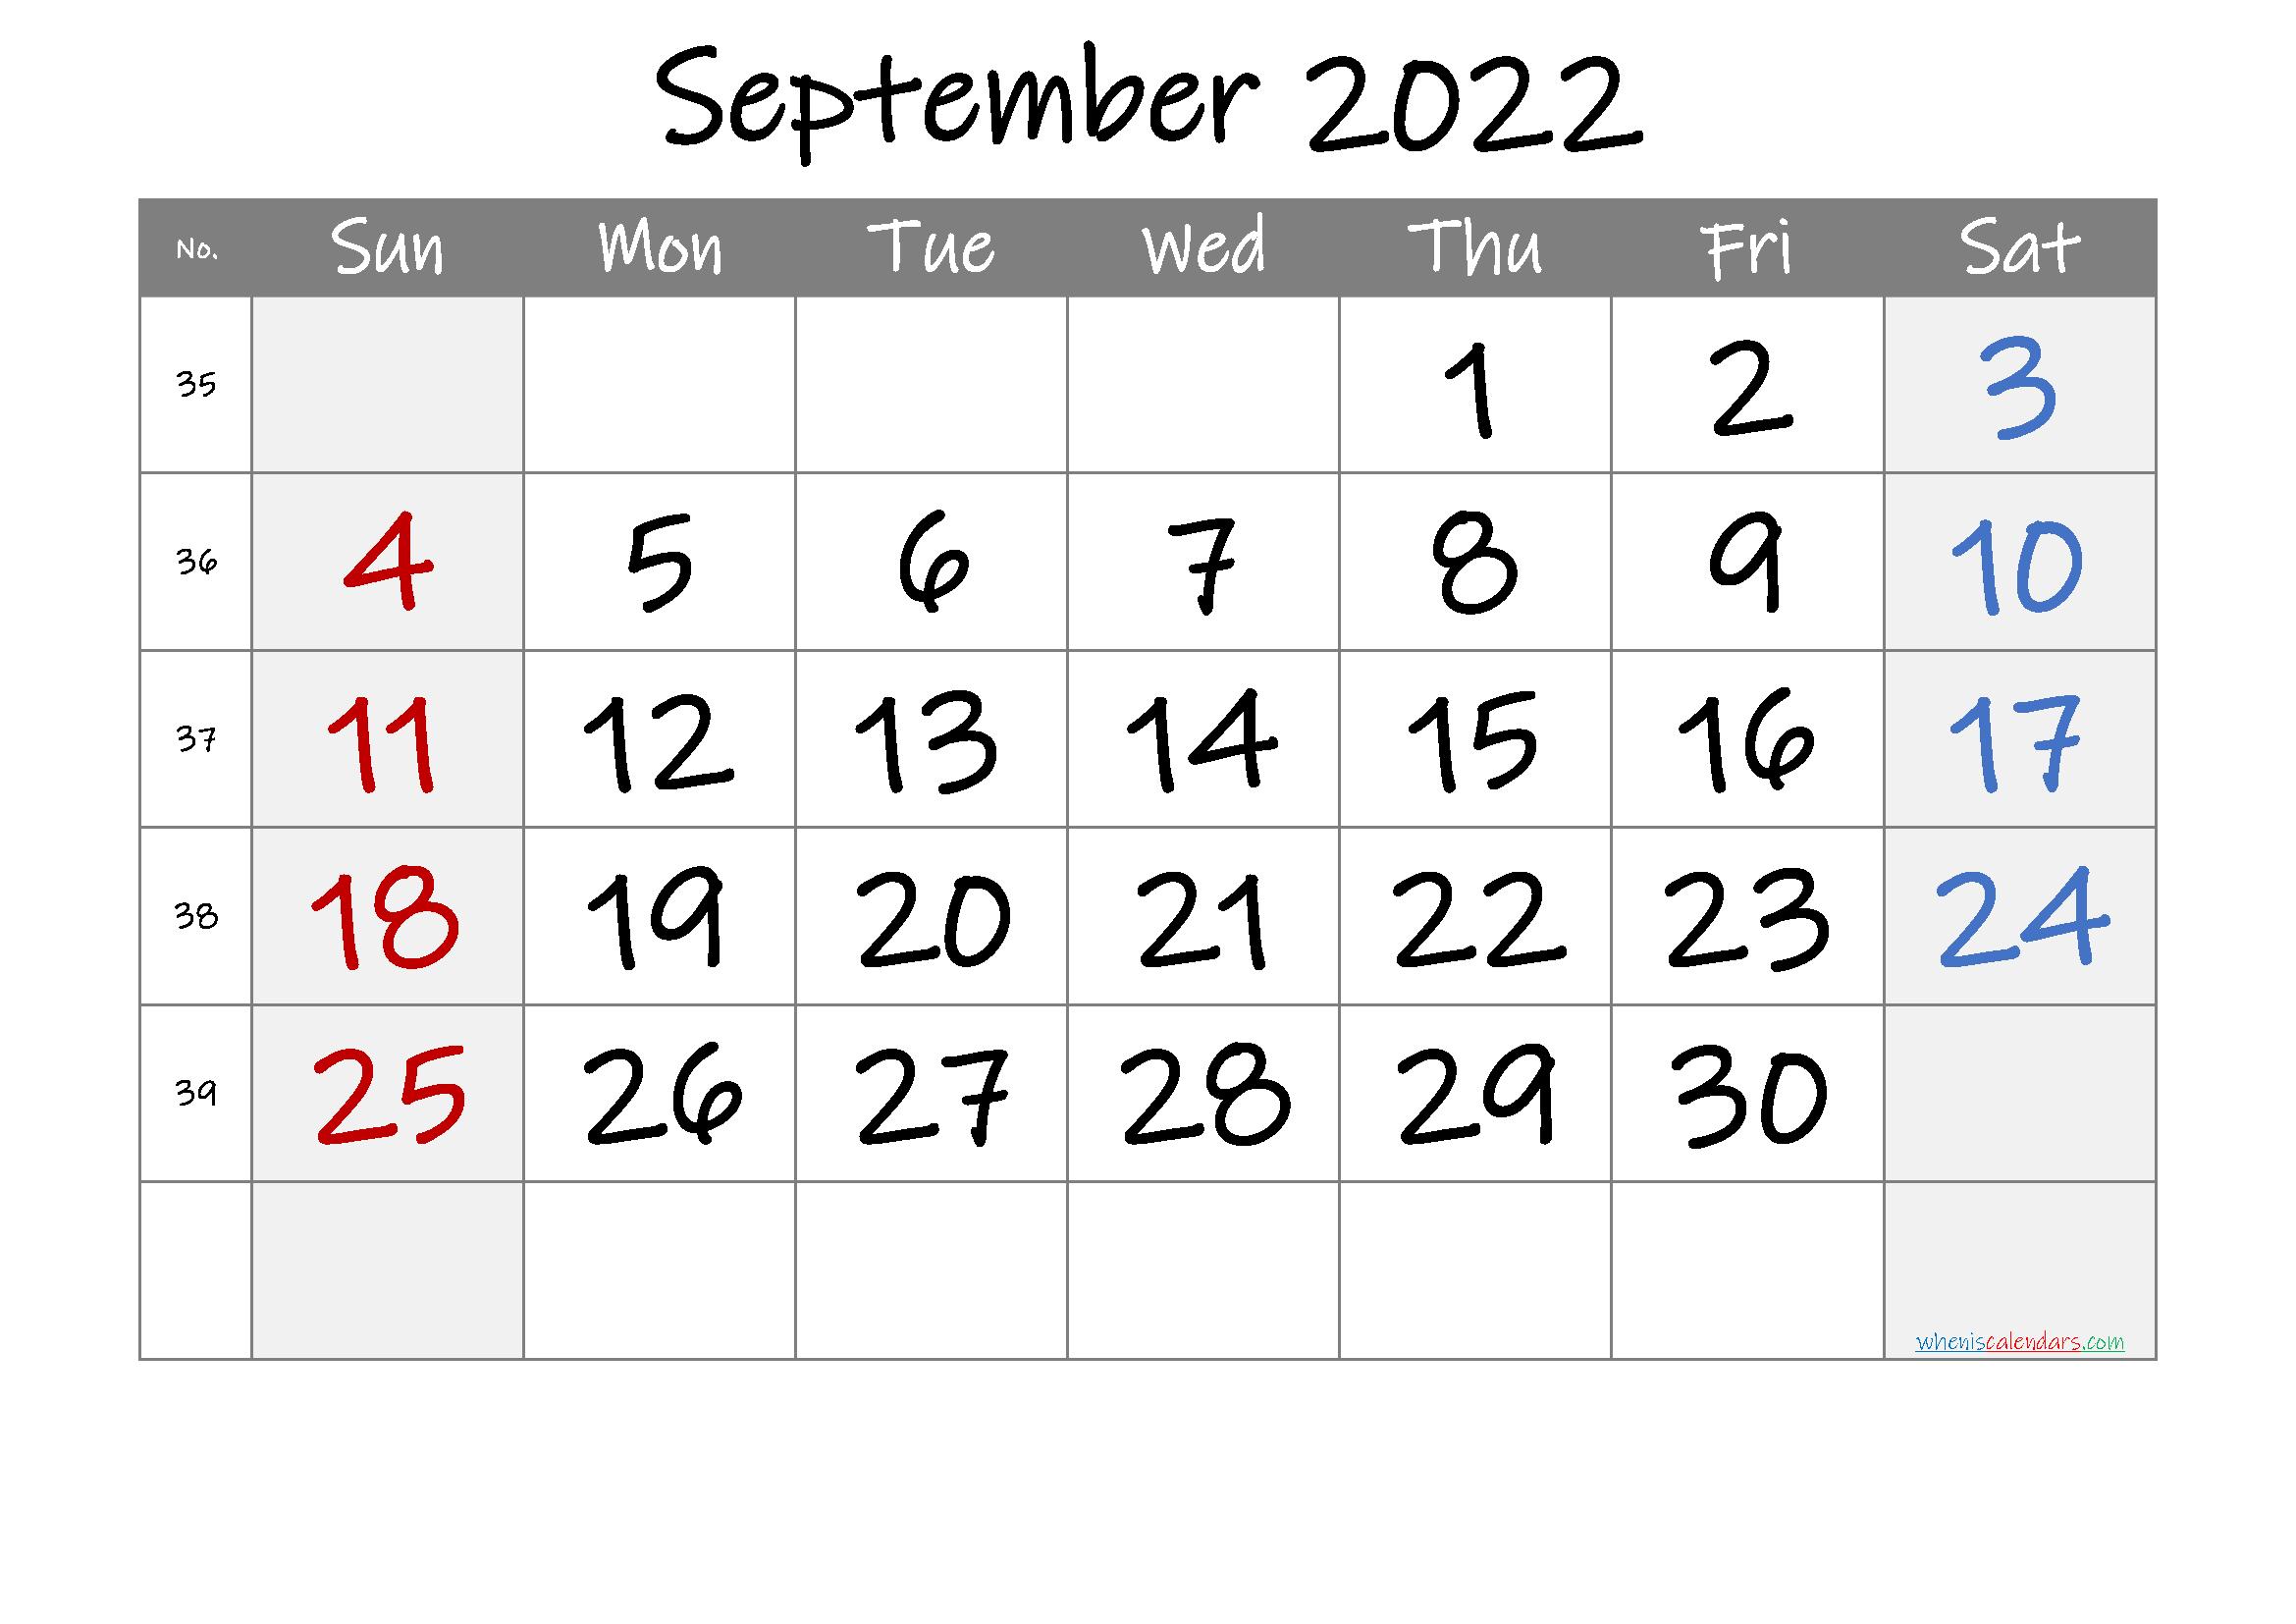 September 2022 Printable Calendar With Week Numbers [Free within September 2022 Calendar Template